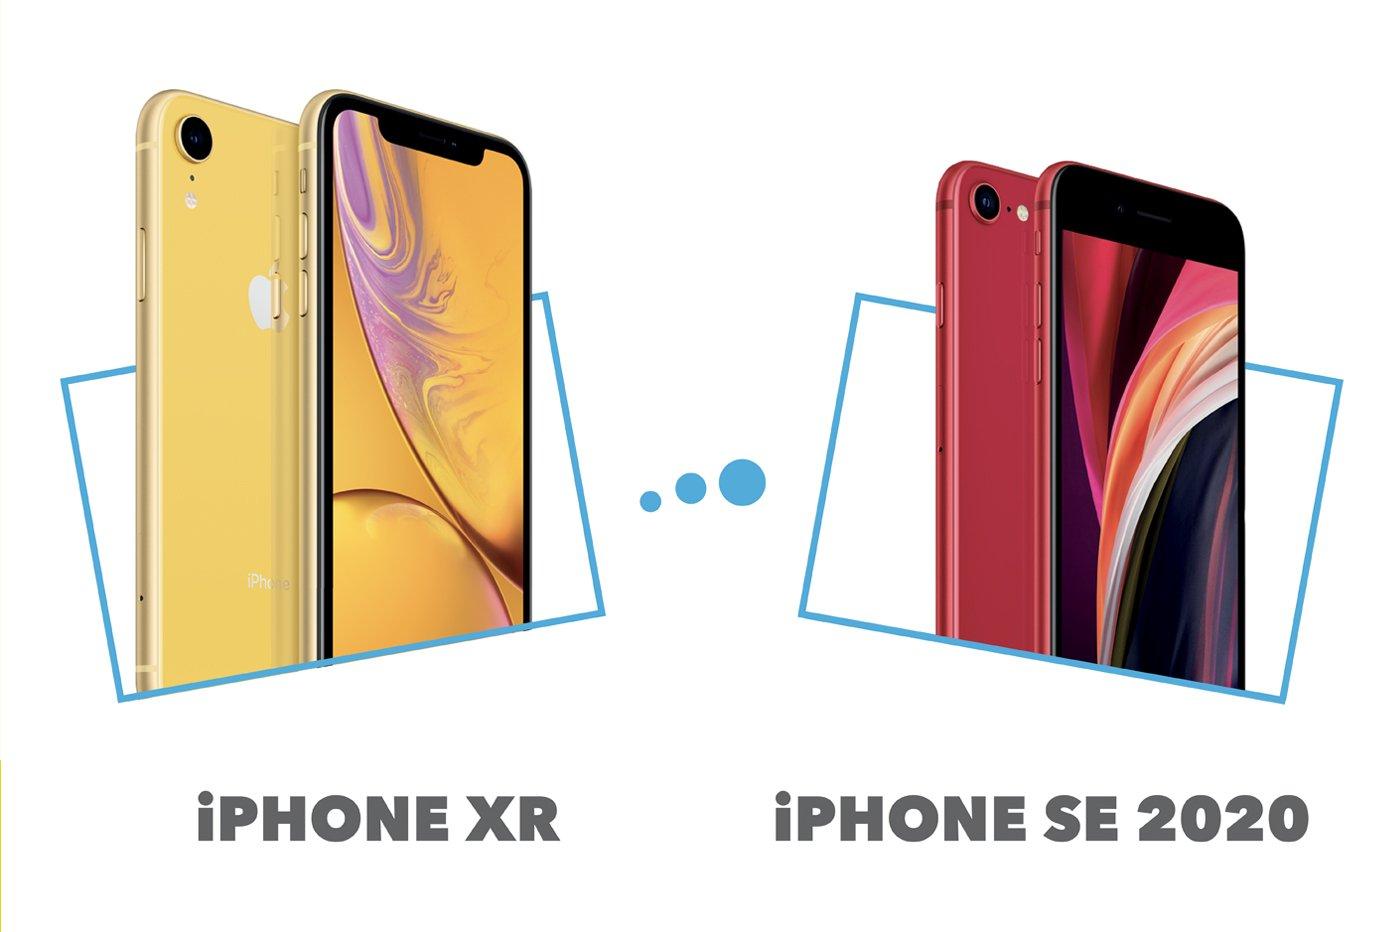 iPhone XR vs iPhone SE 2020